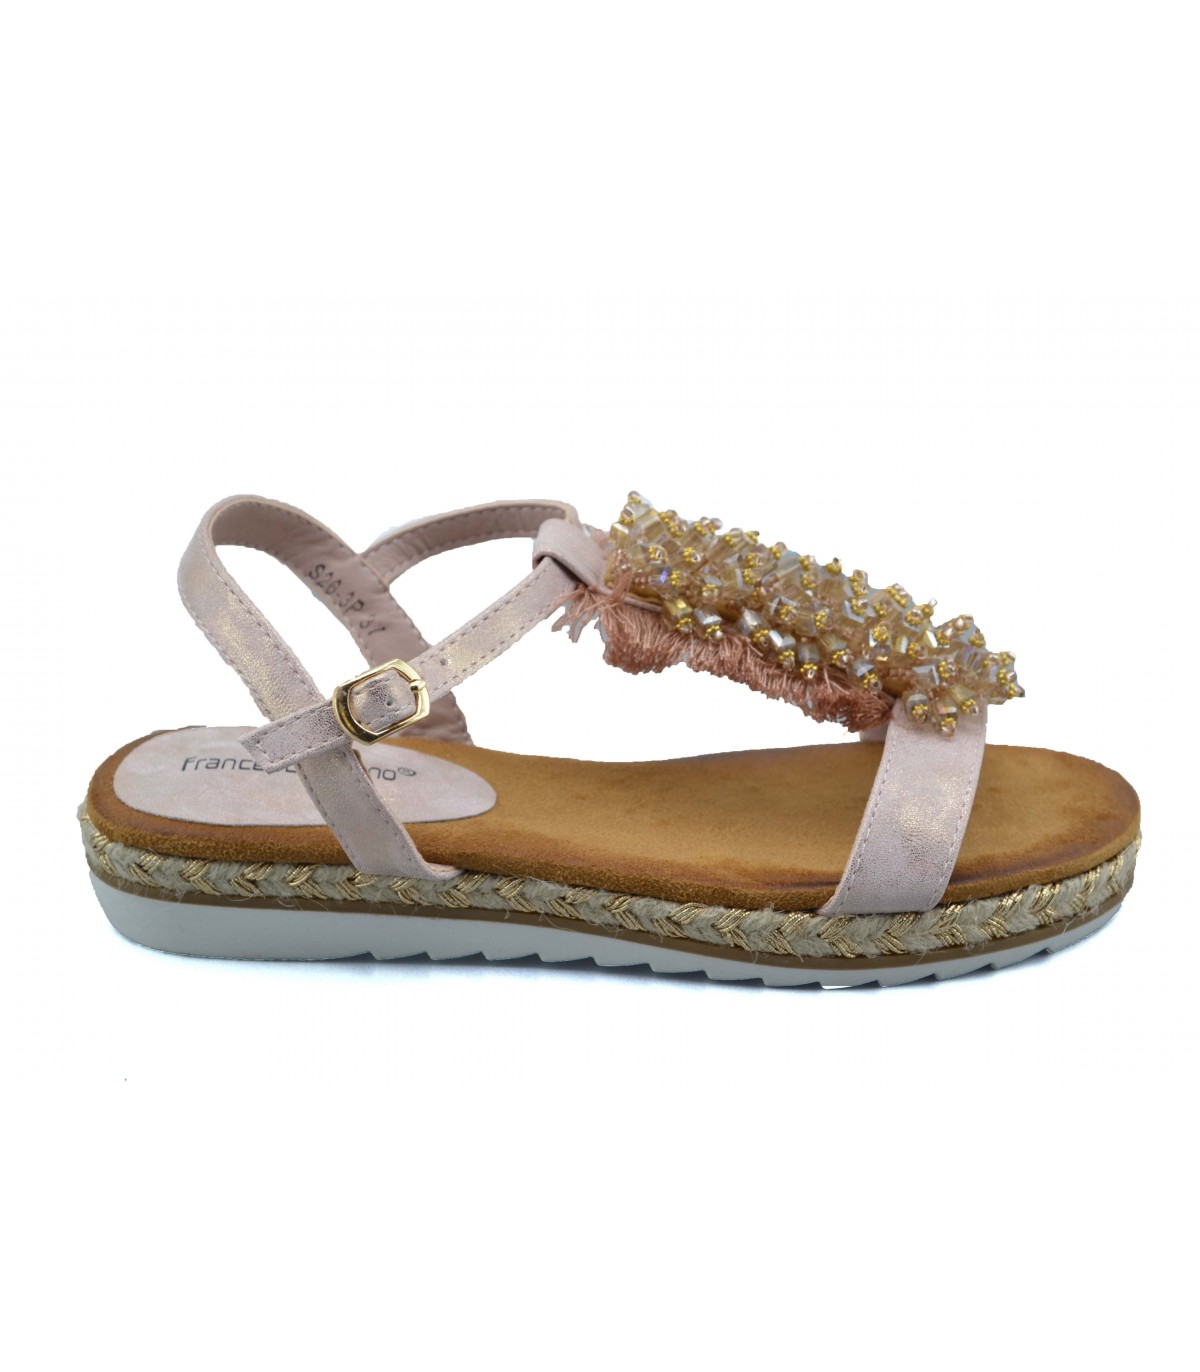 b20357fb Sandalias mujer FRANCESCO MILANO Willy | Zapatos Online | Calzado Mujer